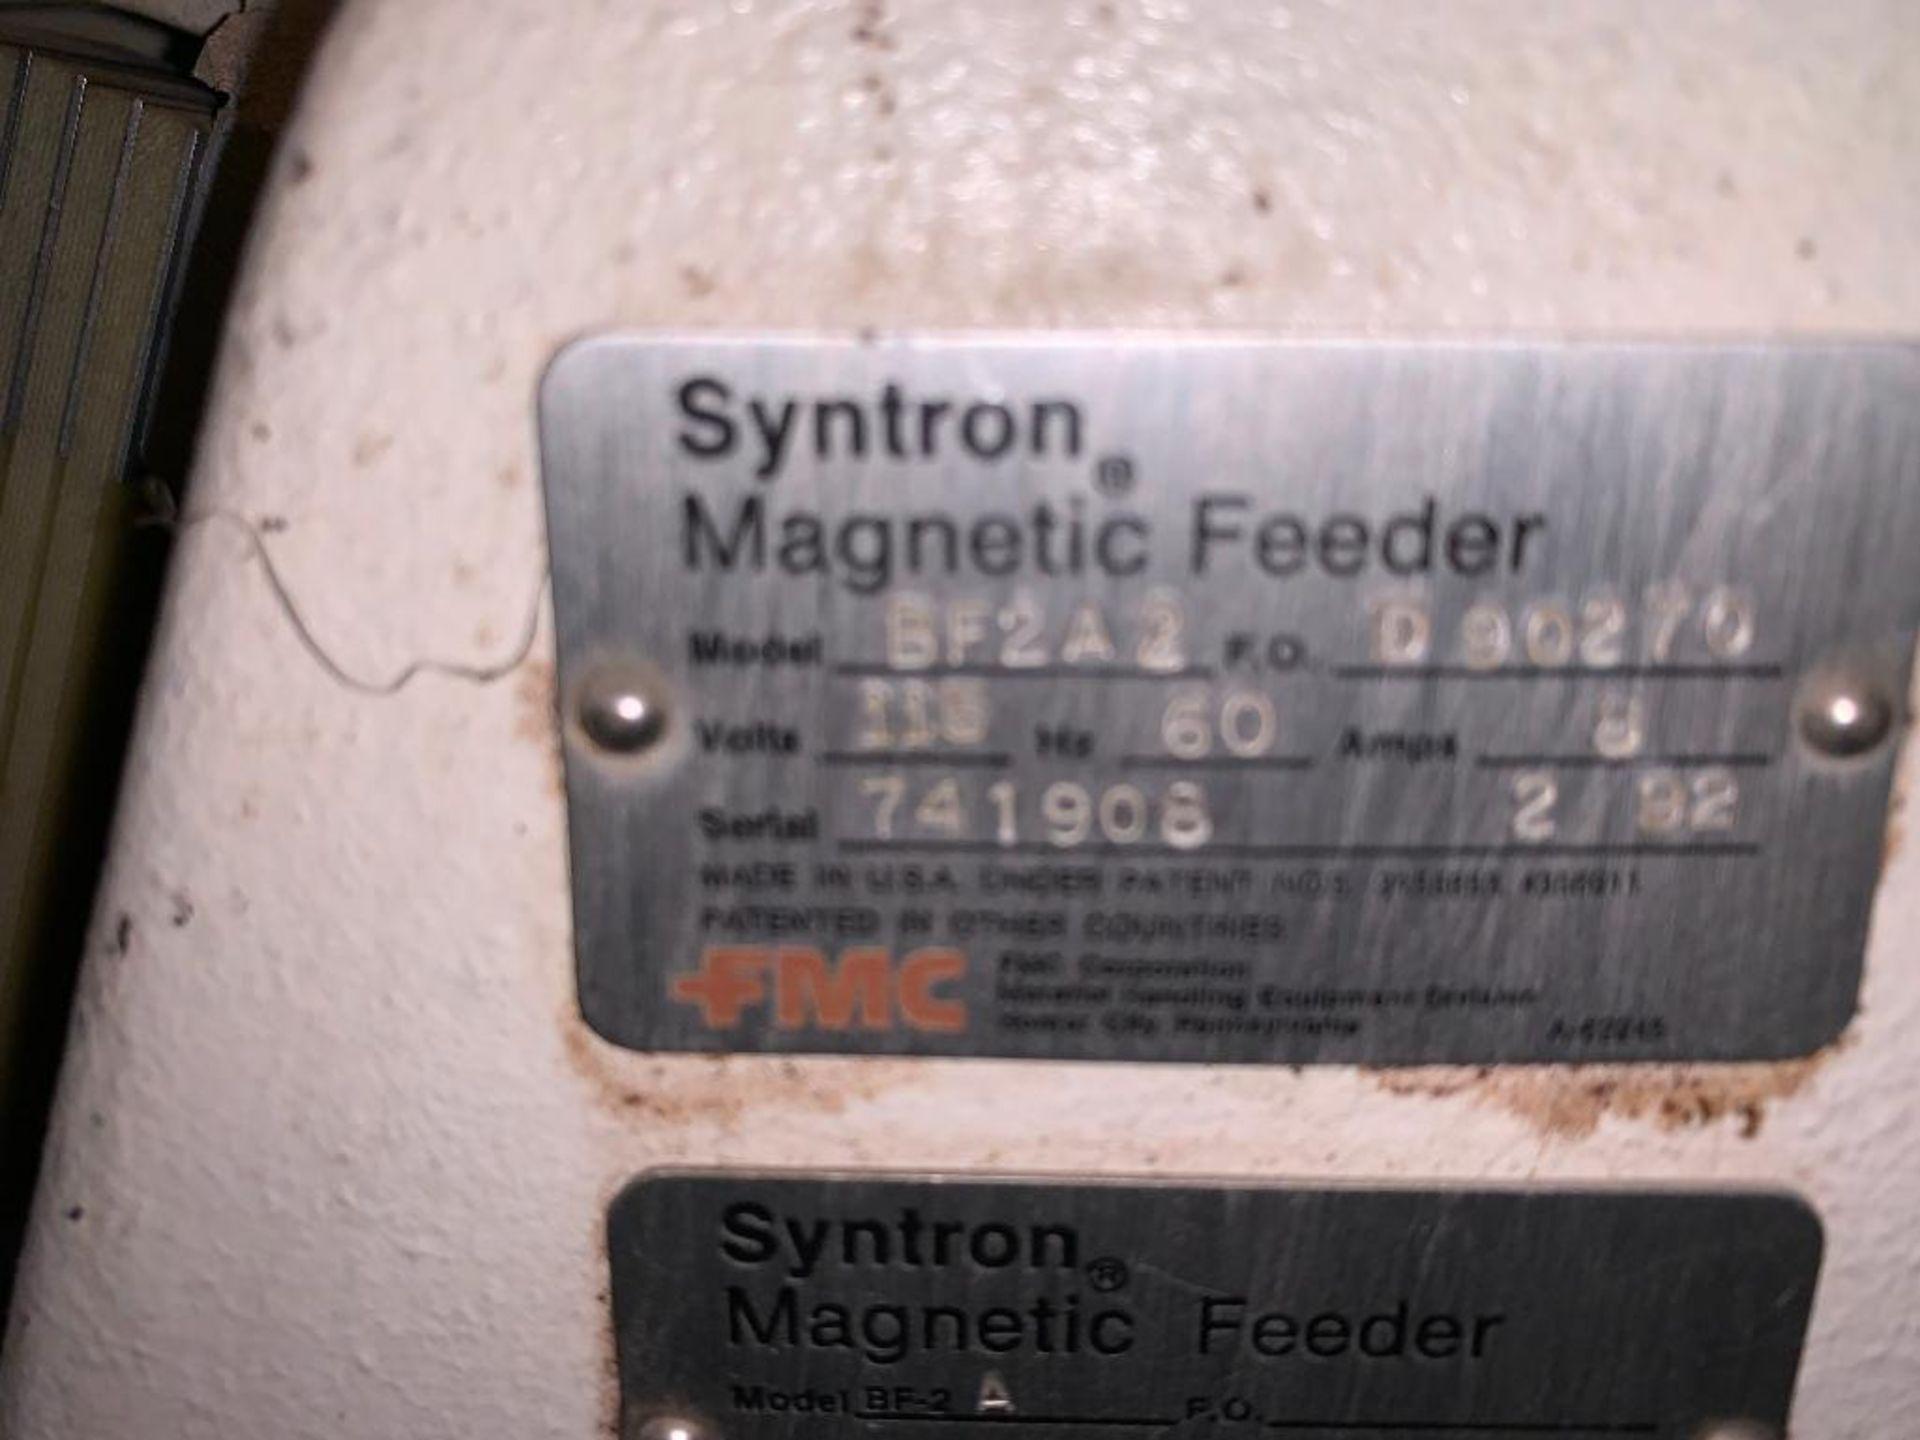 Aseeco mild steel cone bottom bulk storage bin - Image 21 of 27